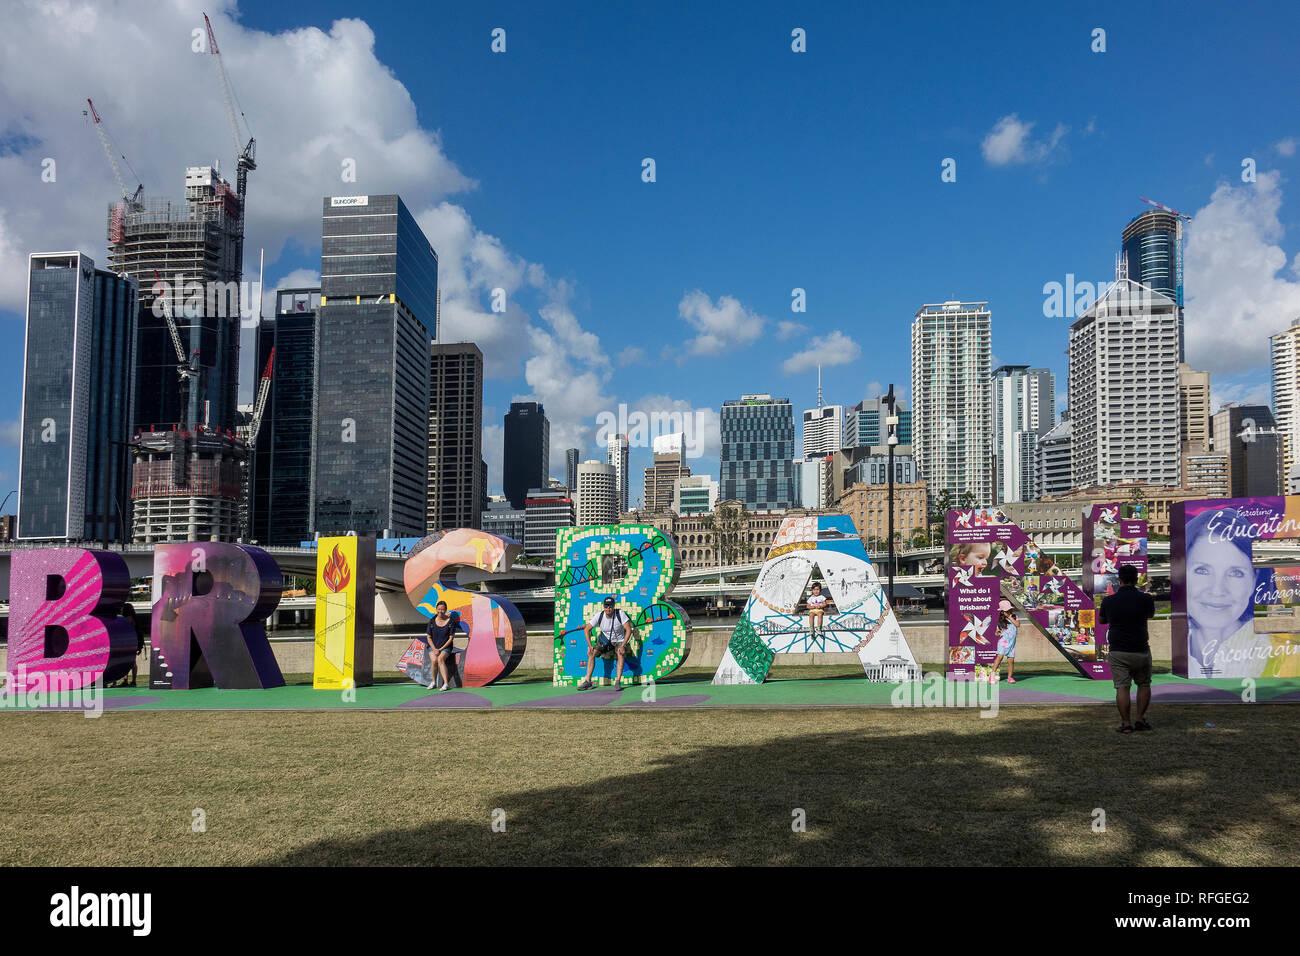 Australia, Queensland, Brisbane, skyline and colourful 'Brisbane' sign - Stock Image